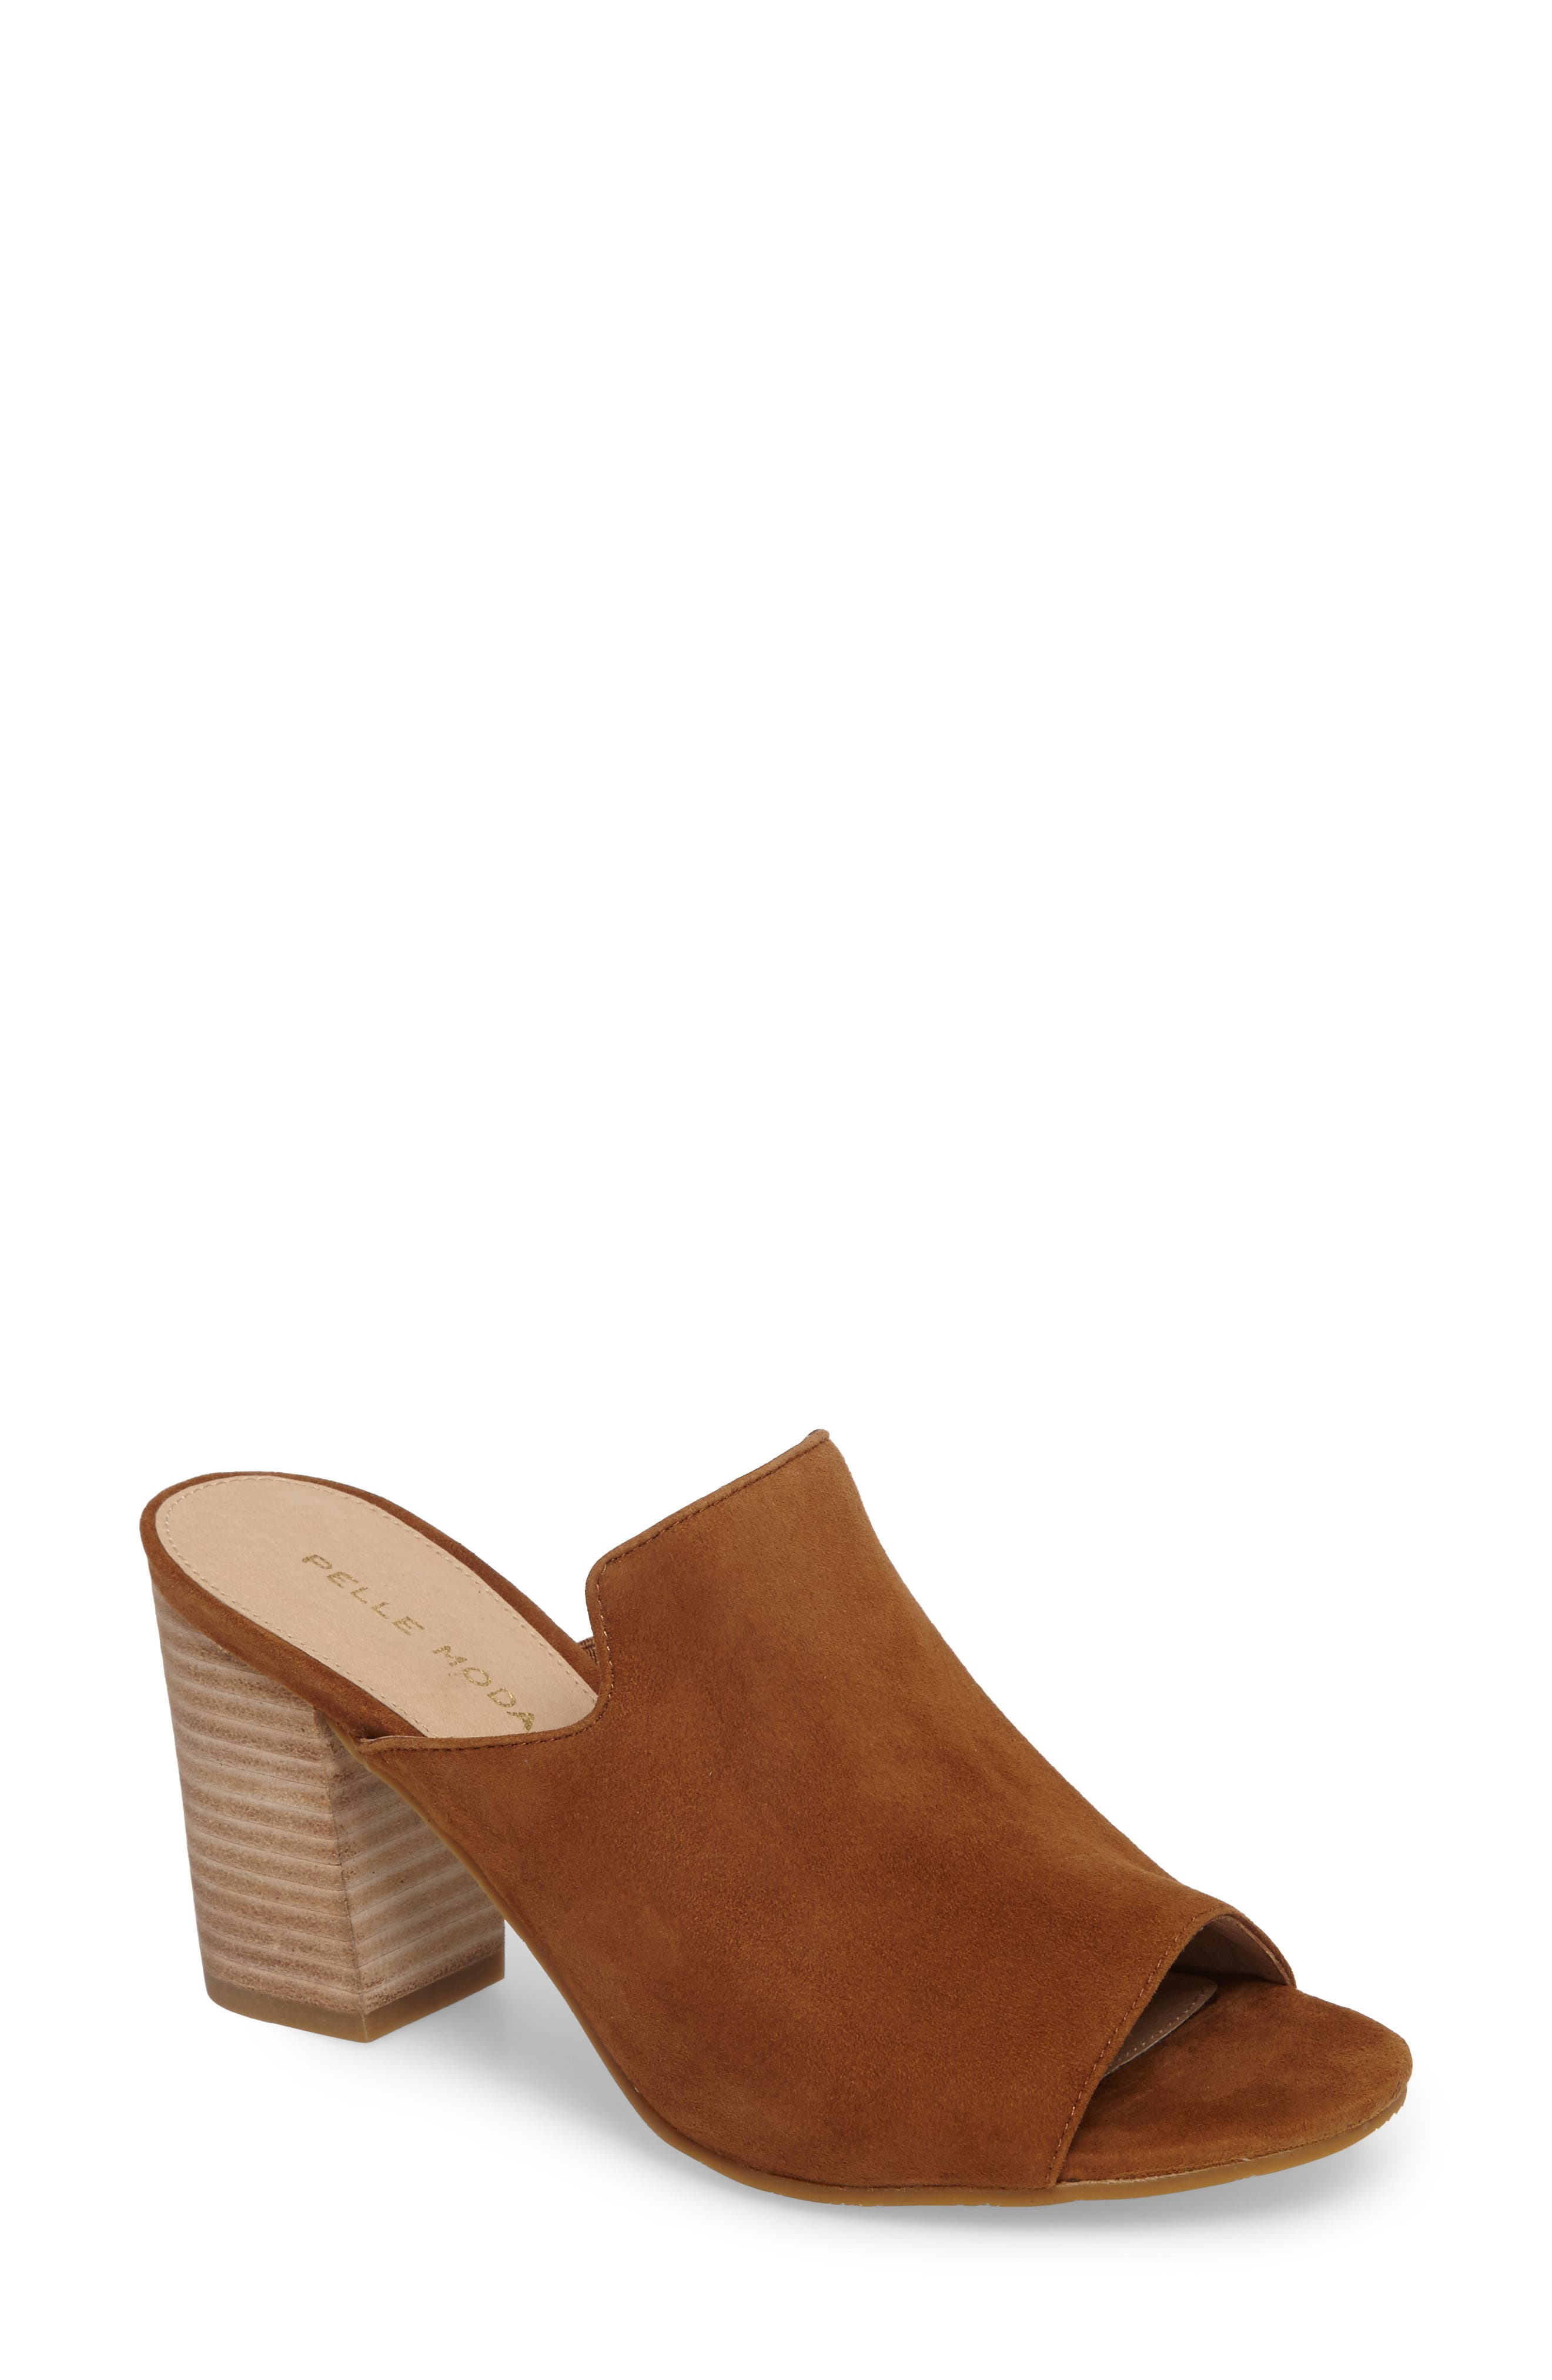 Pelle Moda Blair Peep Toe Mule (Women)